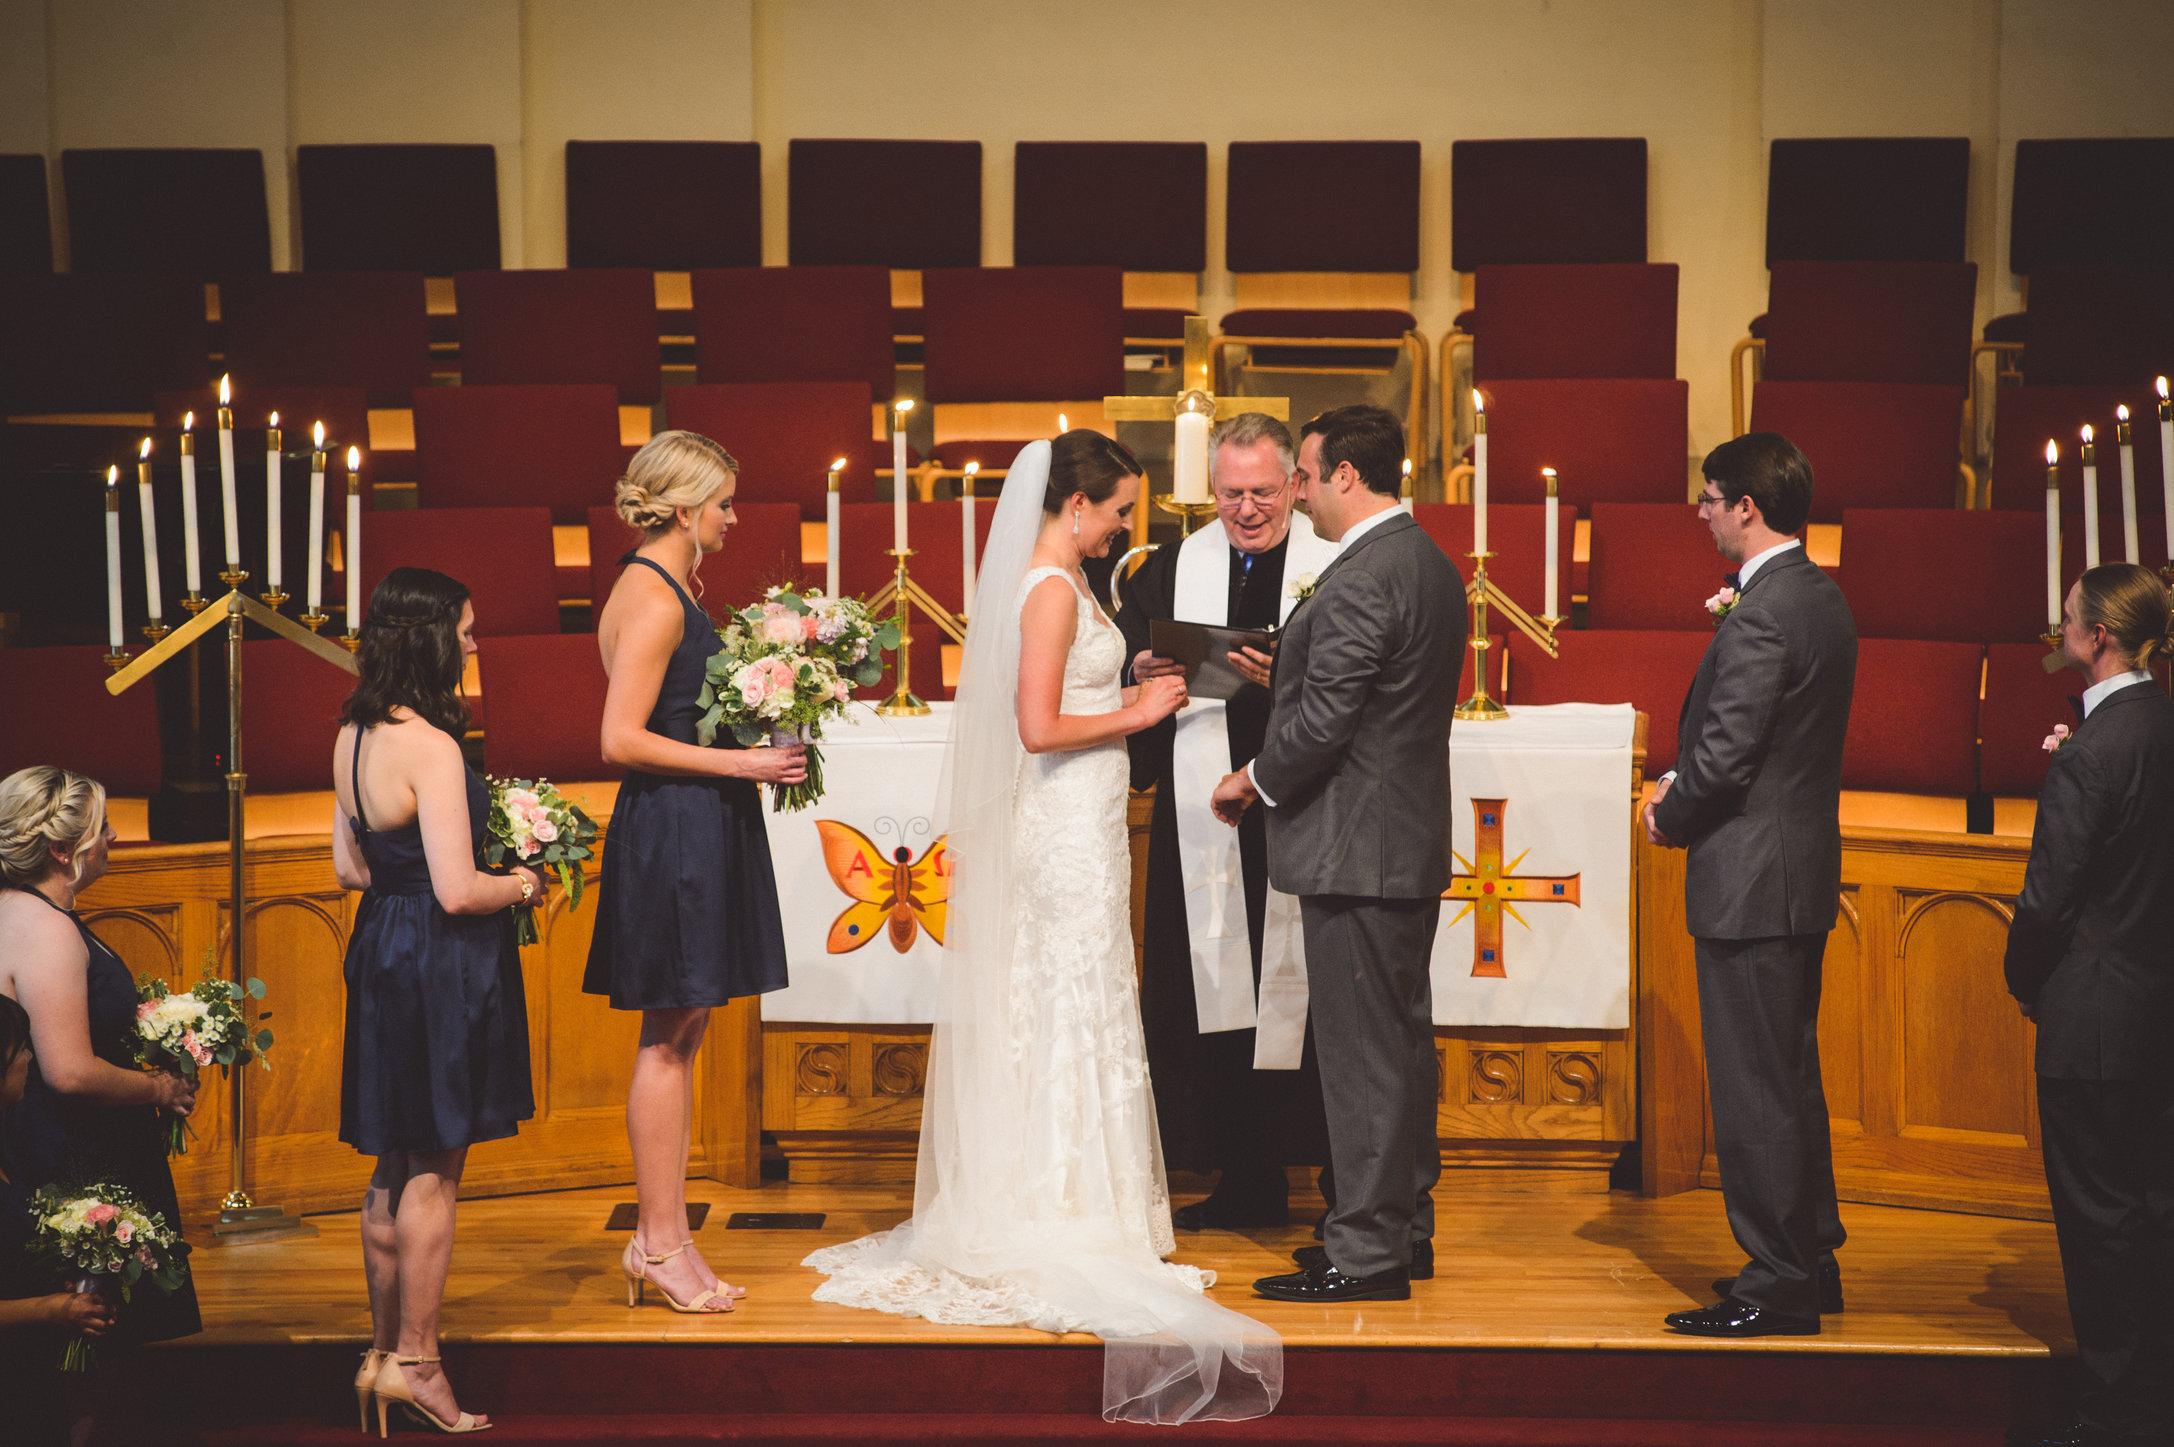 SandC-wedding-214.jpg